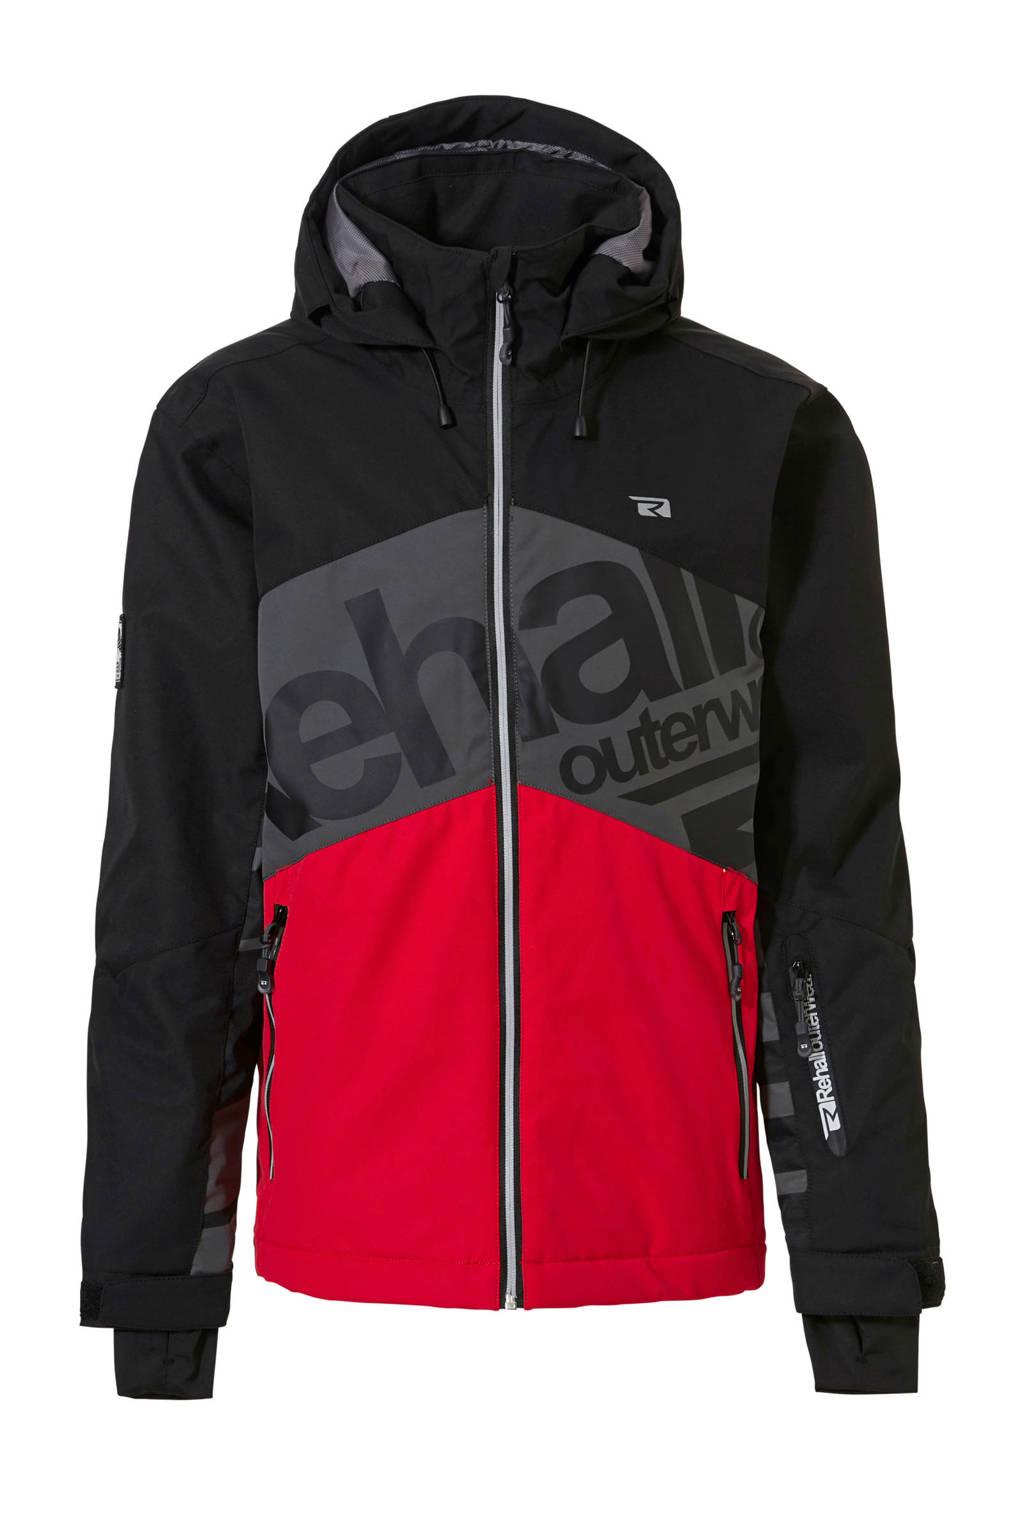 Rehall jack Raid-R jr rood/zwart, Rood/zwart